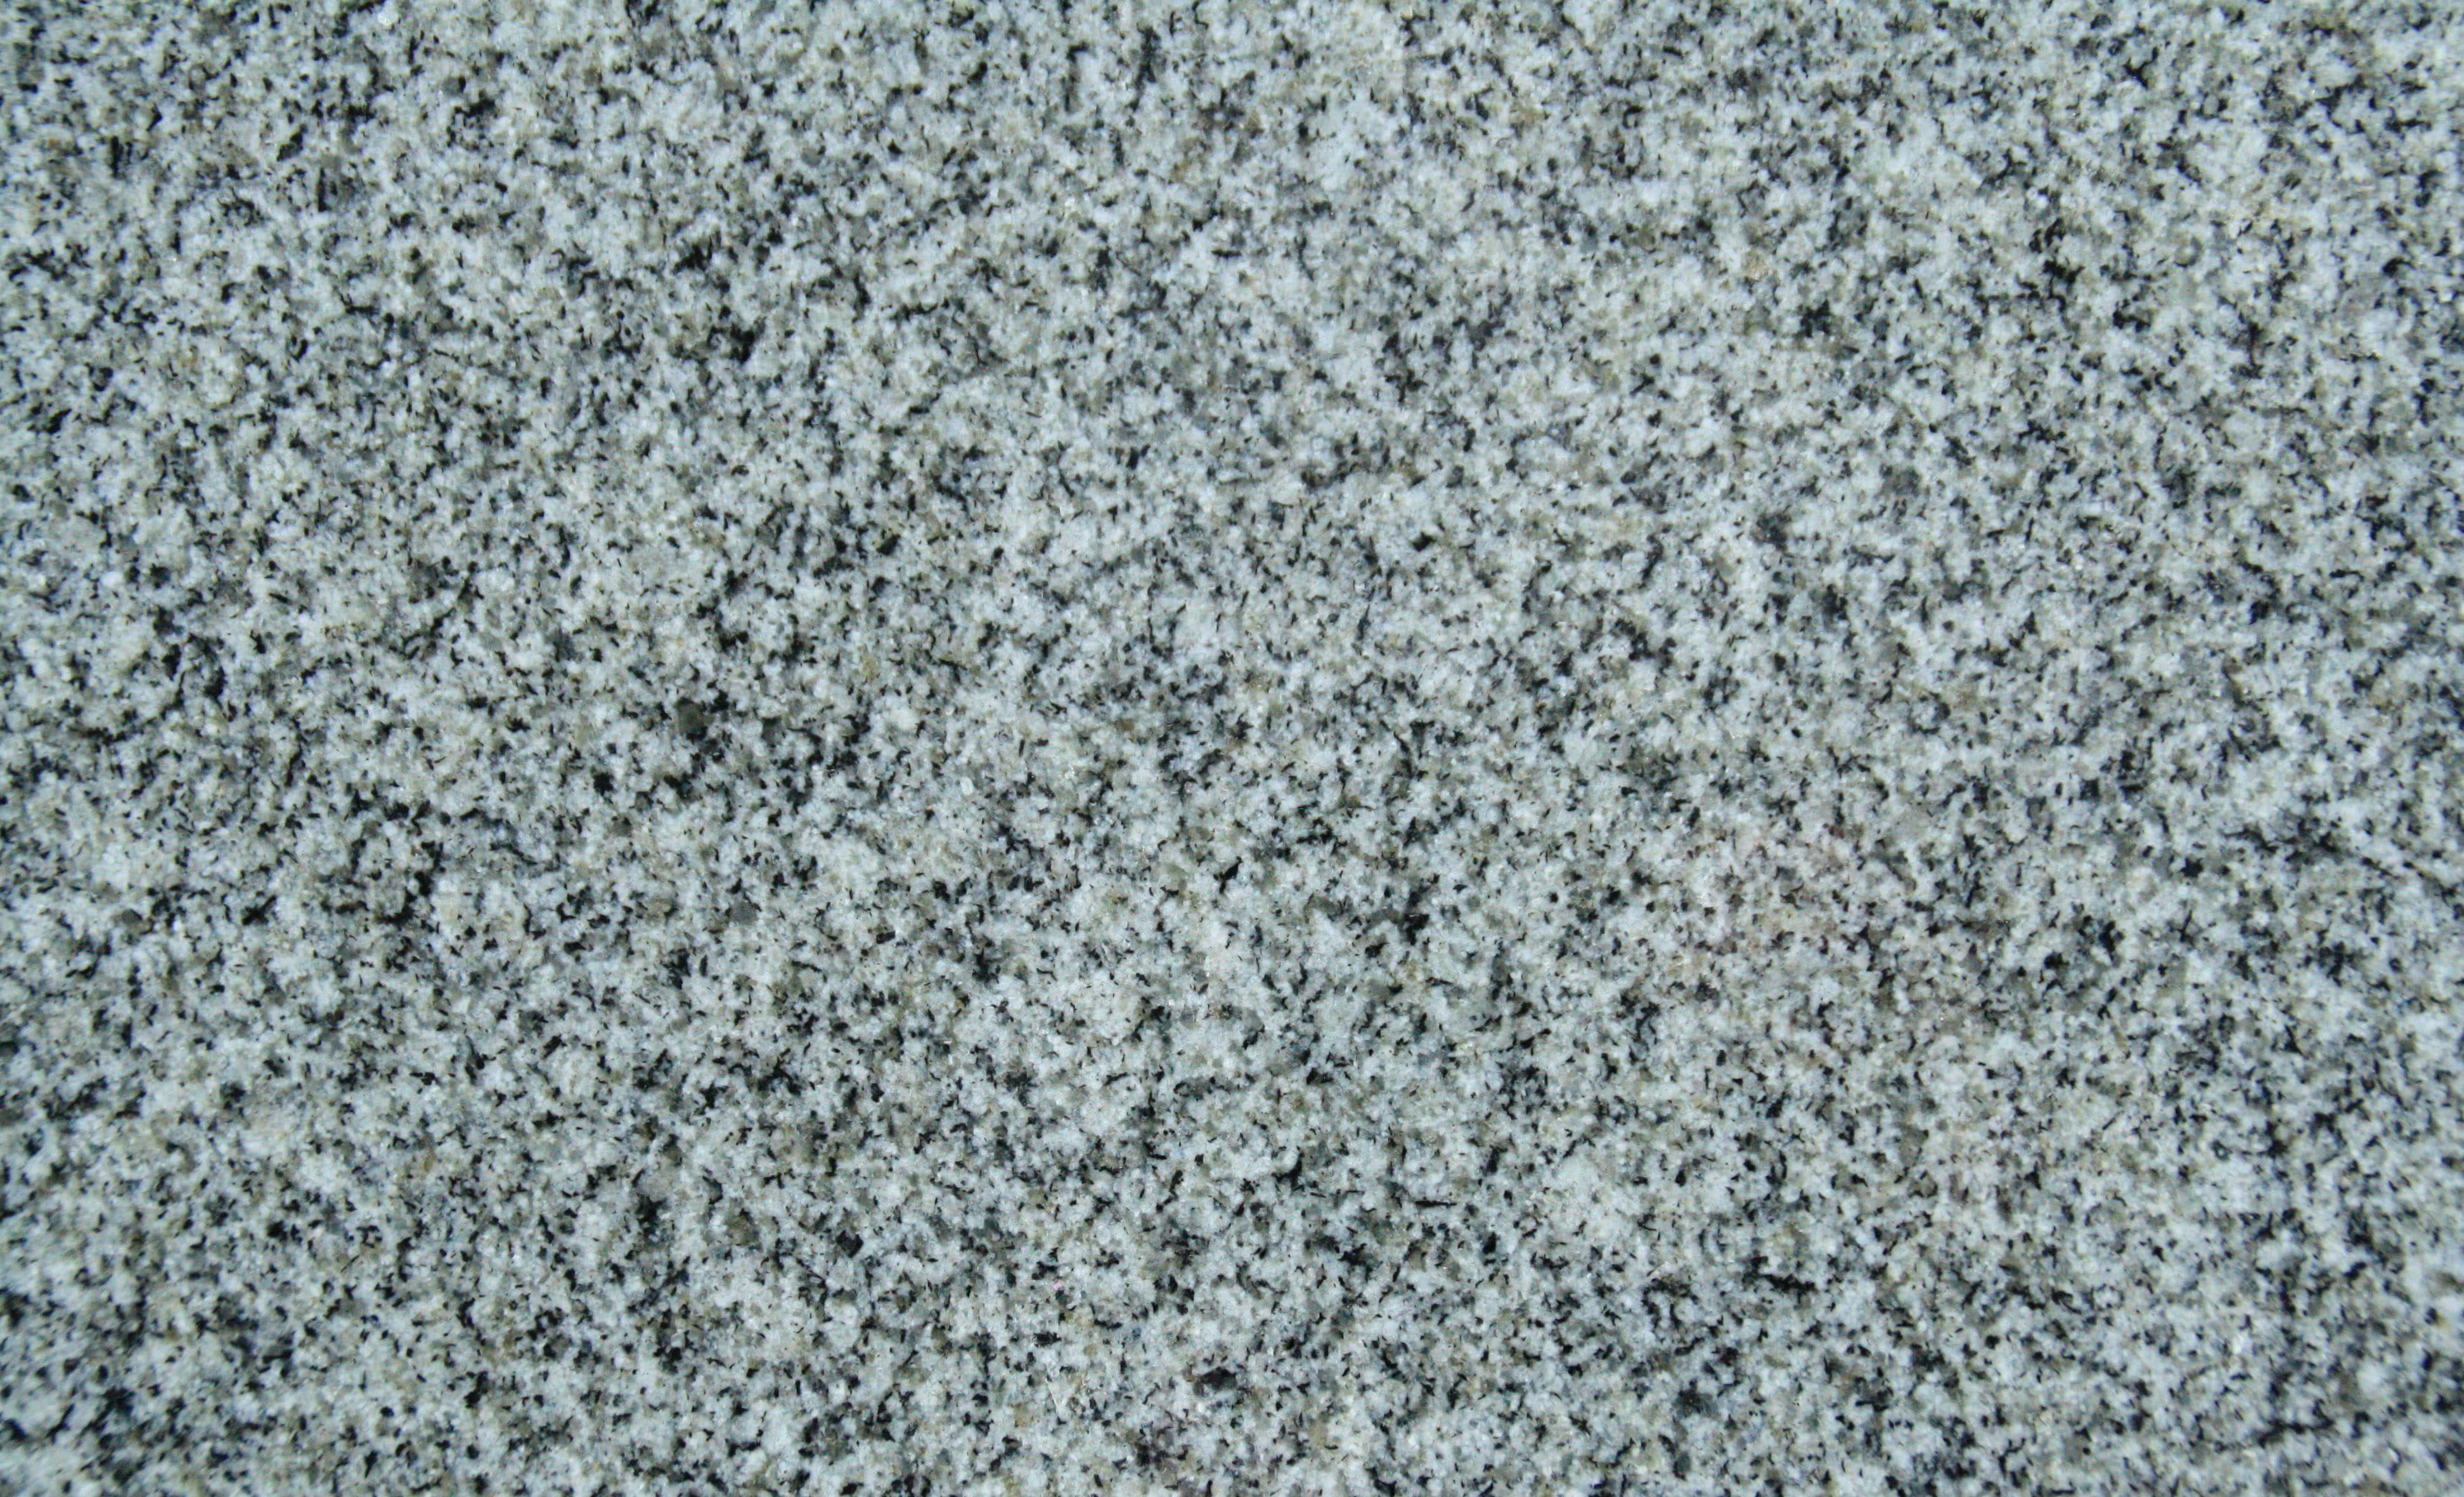 Granite Colours Black Granite White Granite Red Granite Blue Granite